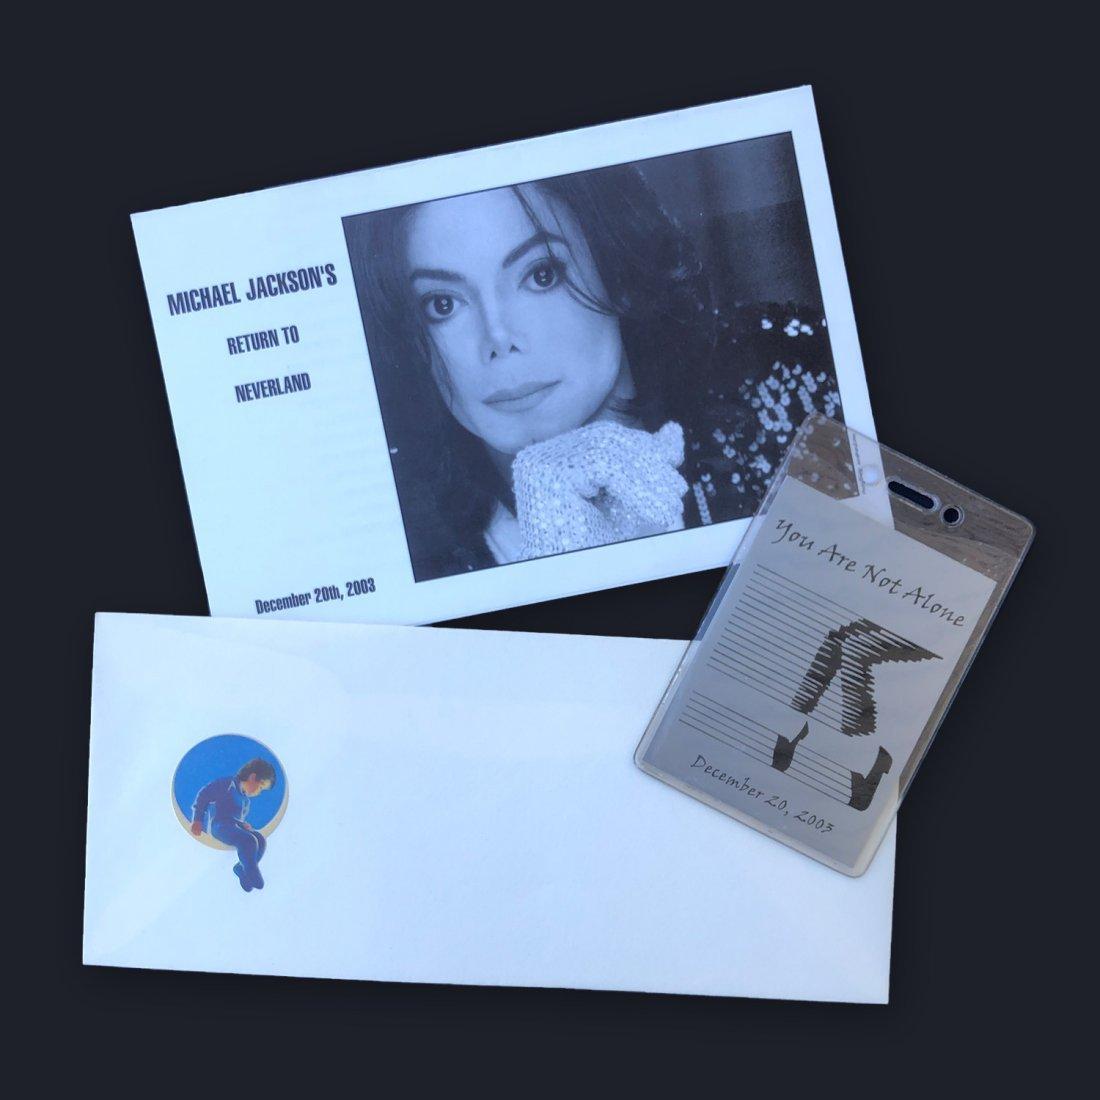 Michael Jackson Lot of 3 Neverland Ranch Items